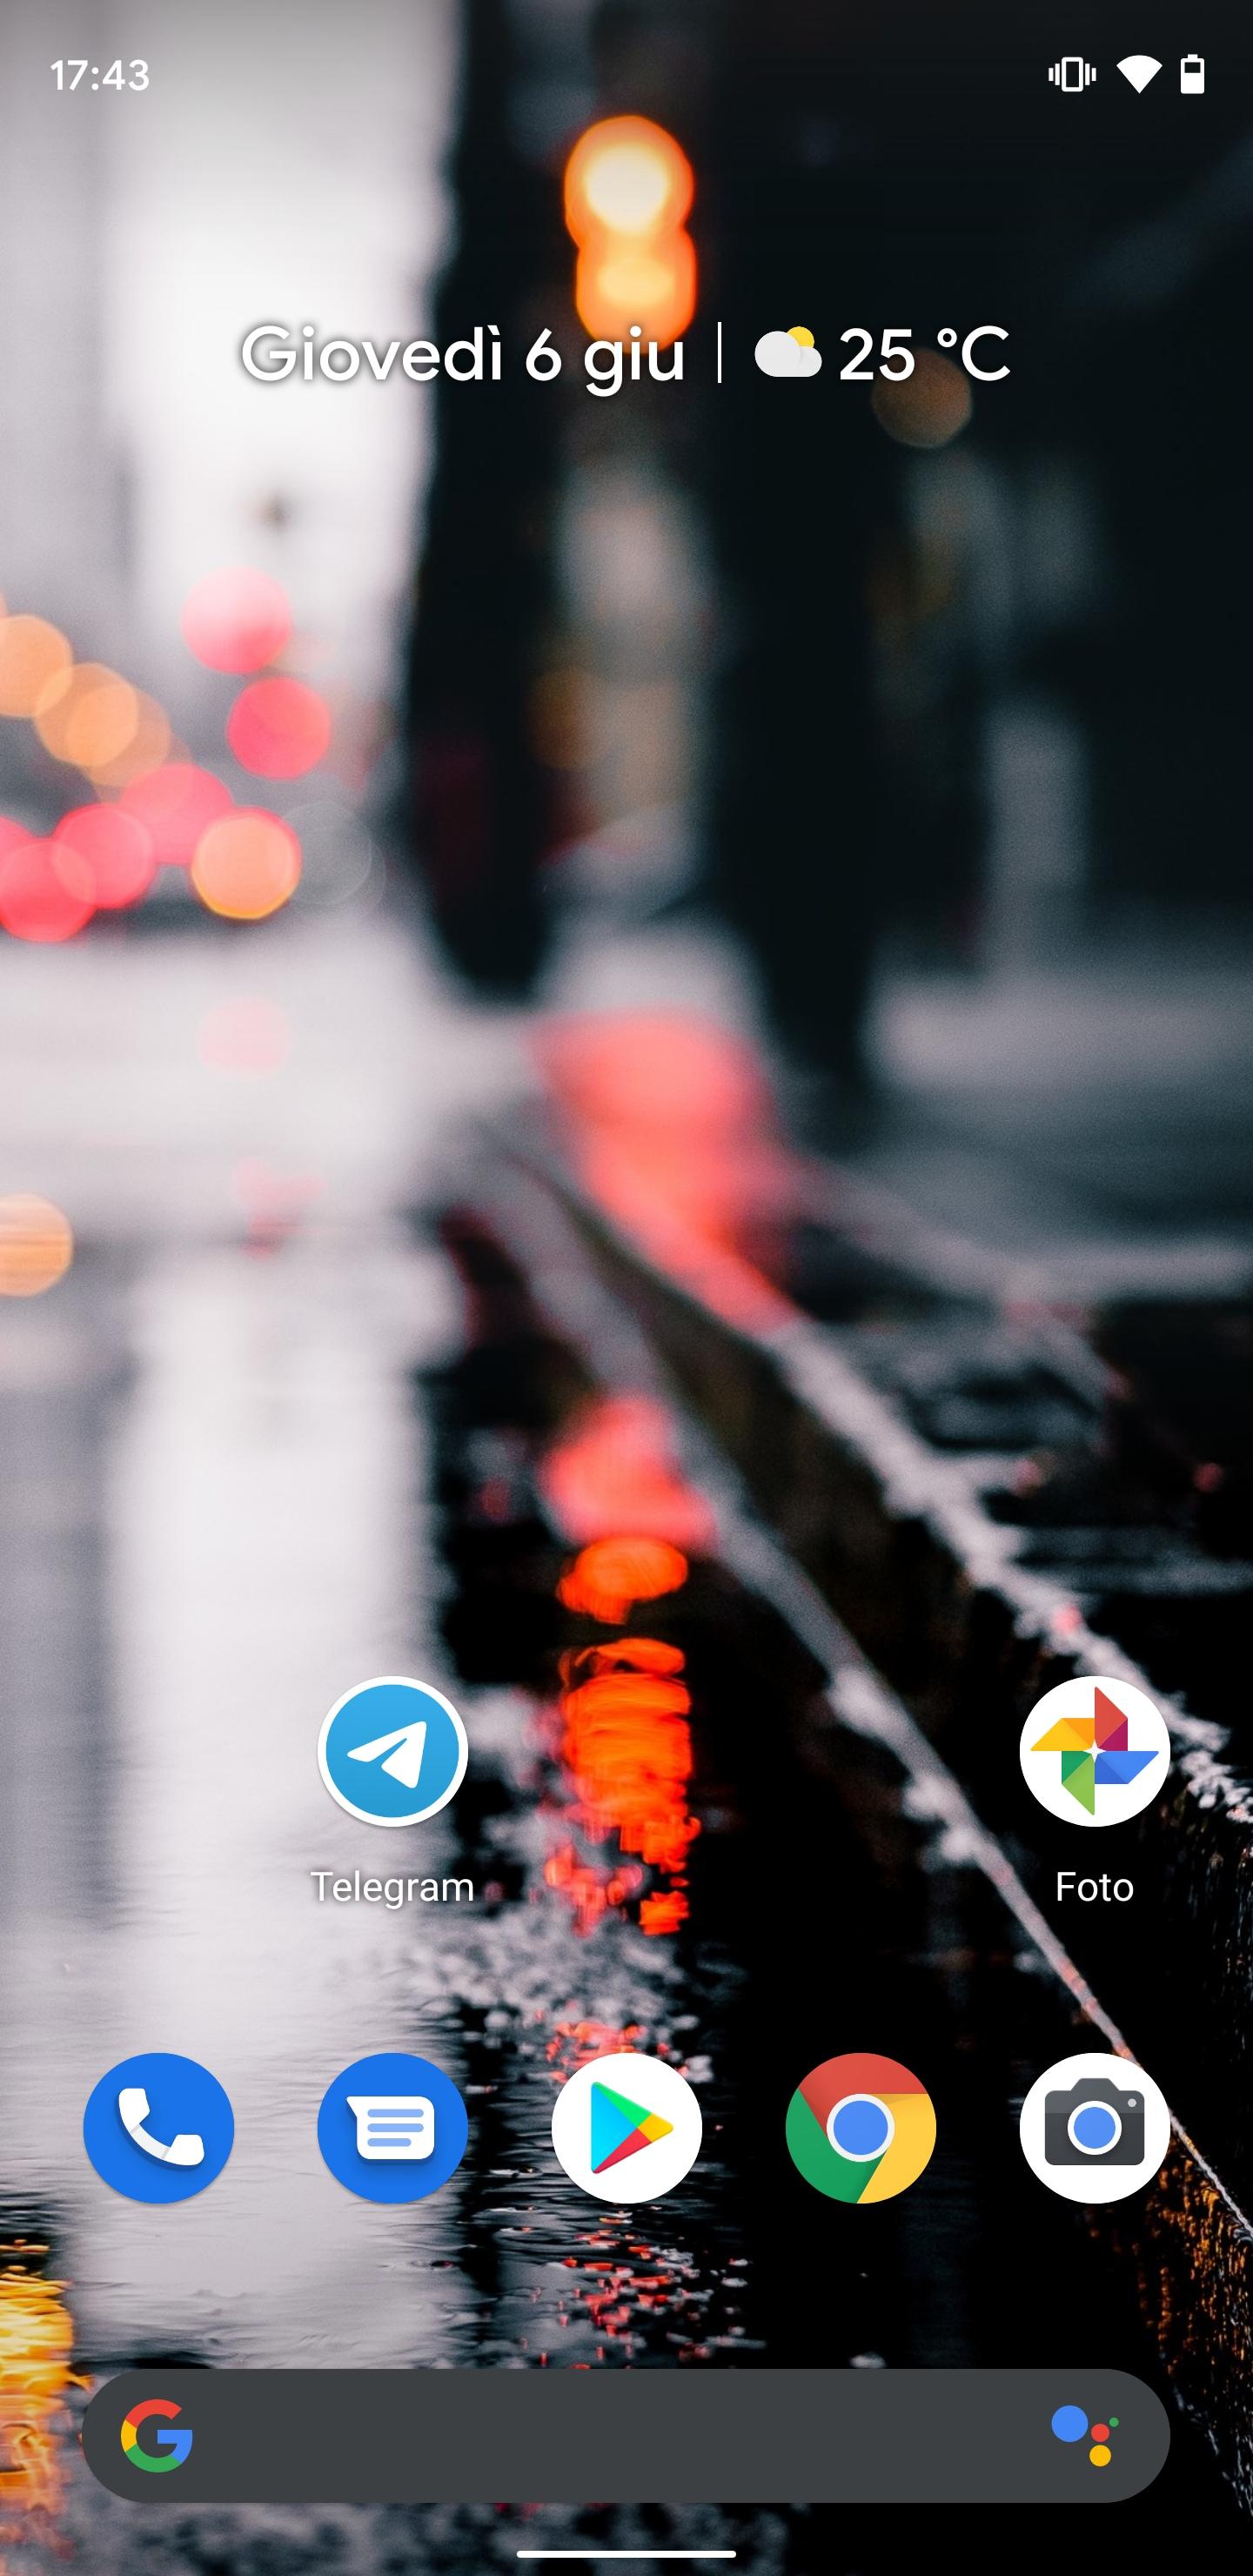 android q beta 4 screenshot (6)